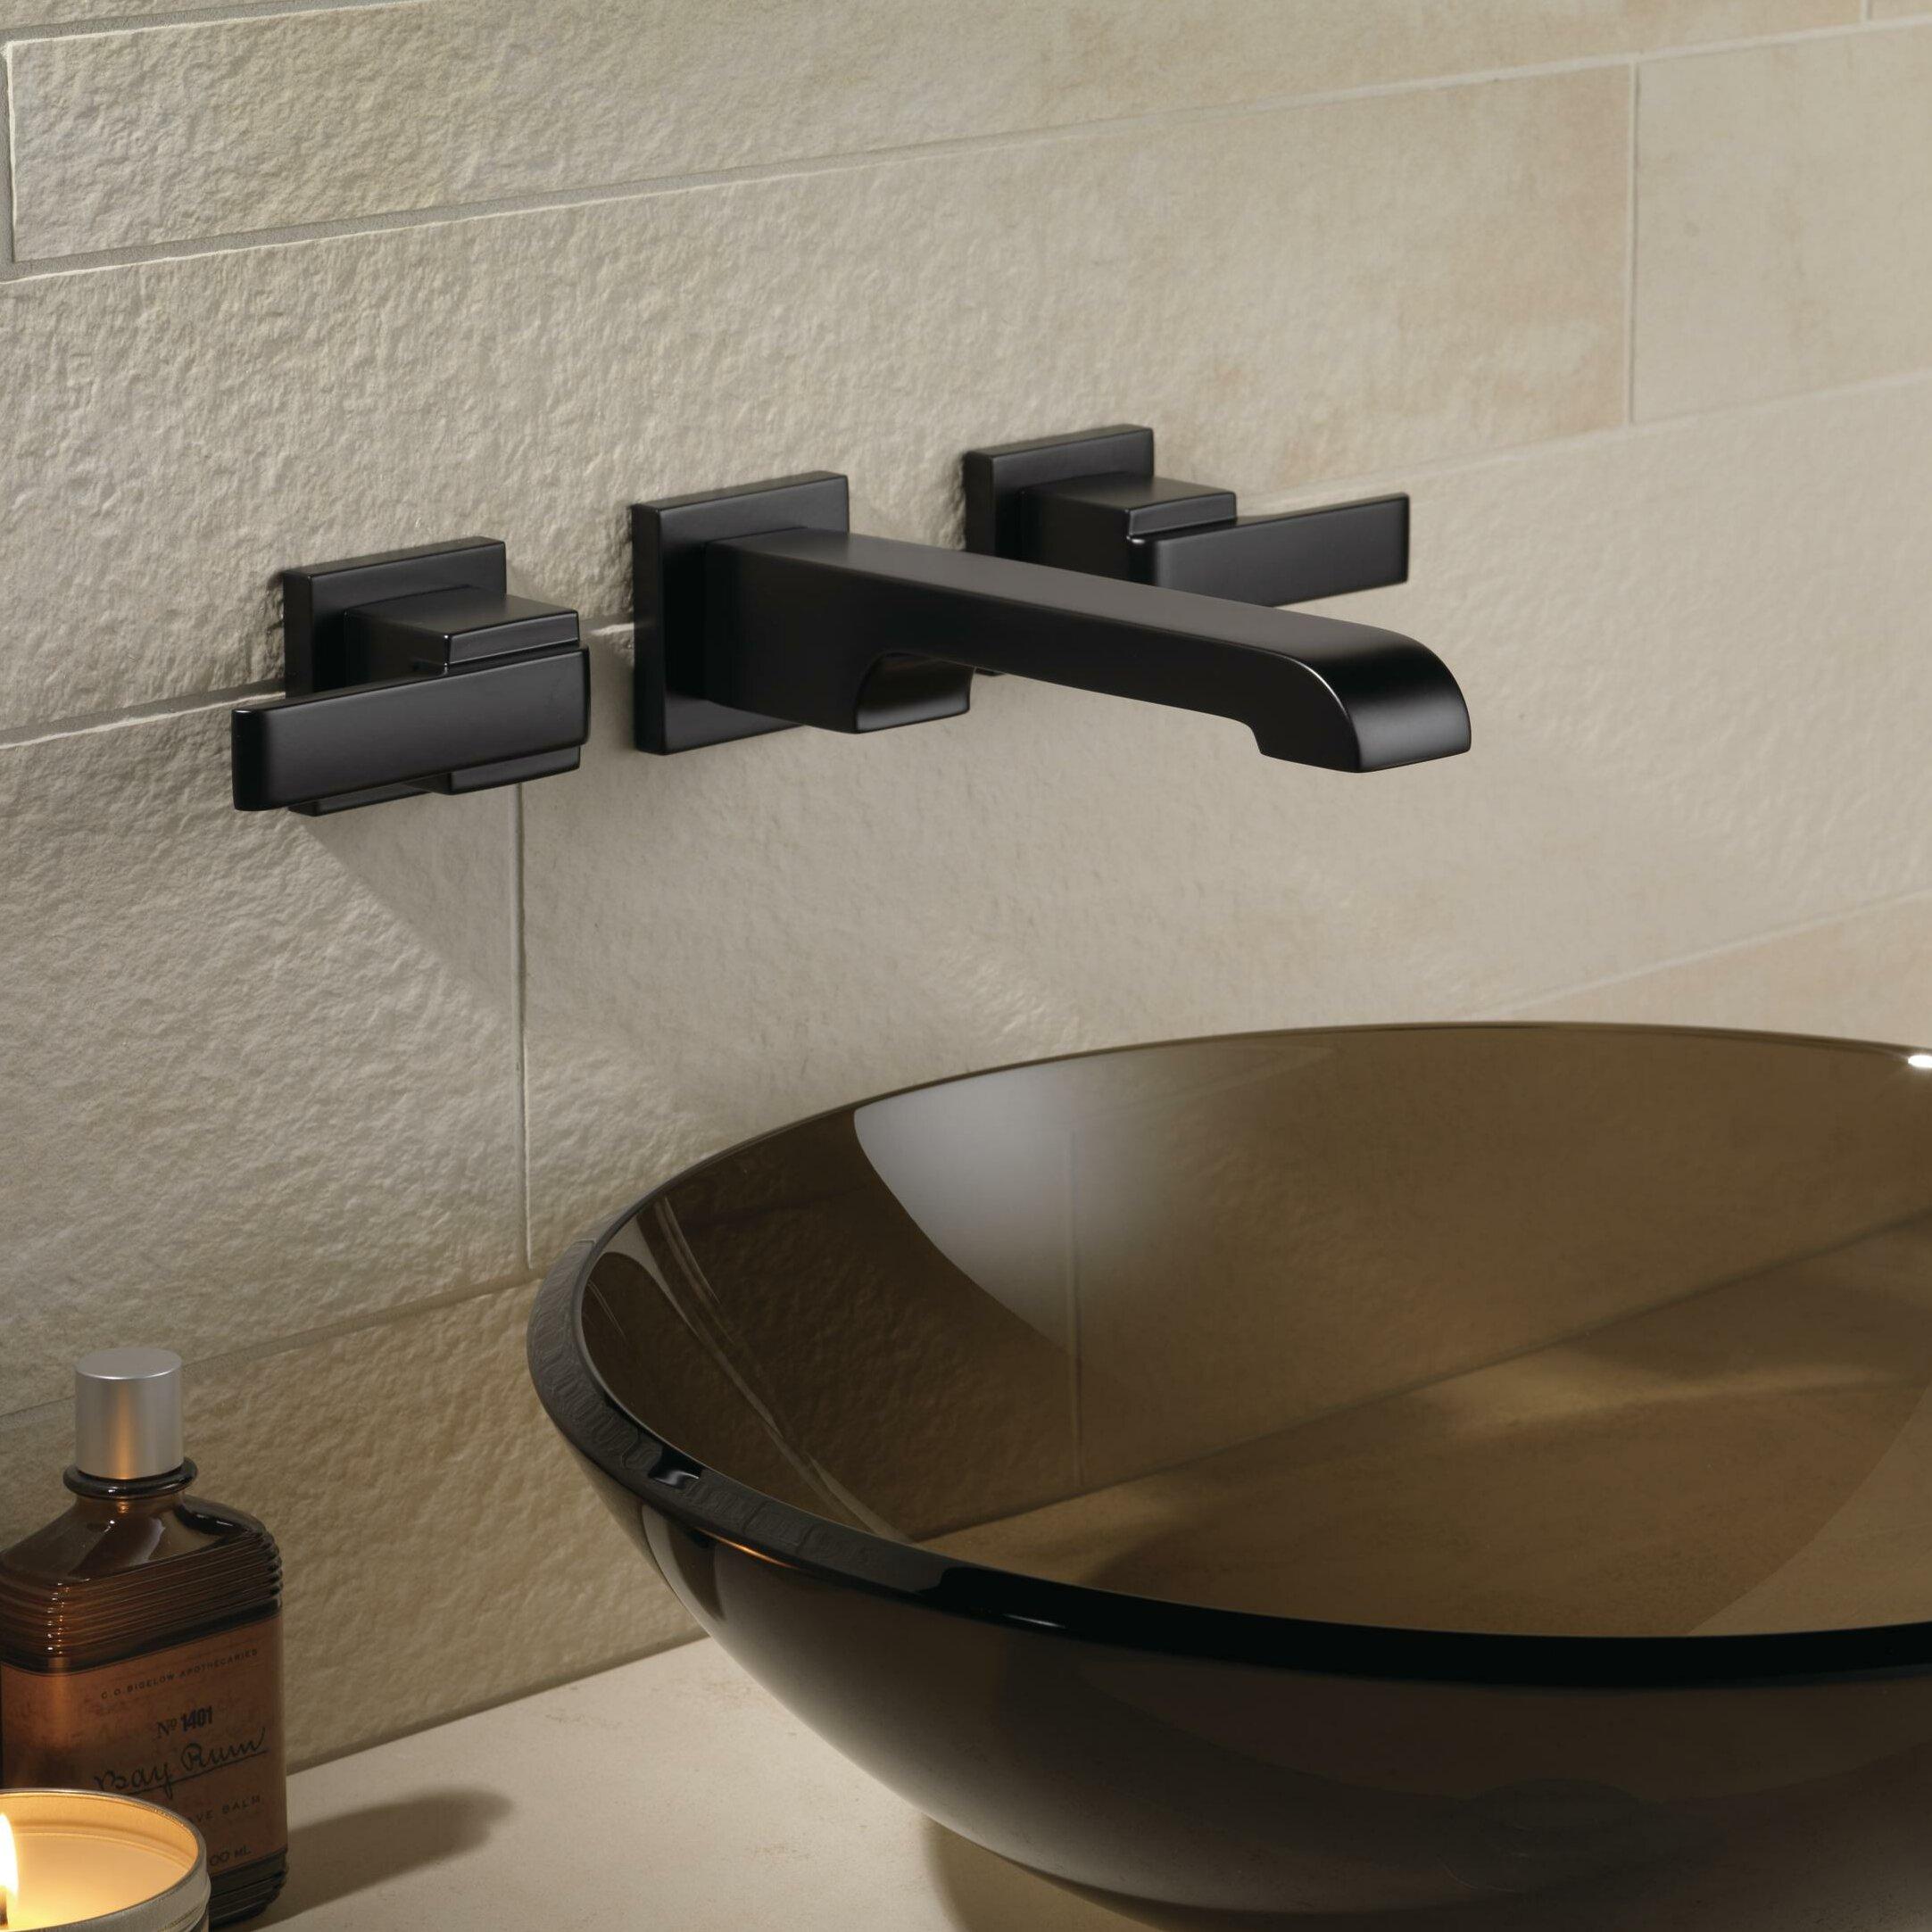 T3567lf Wl Sswl Blwl Delta Ara Two Handle Wall Mounted Bathroom Sink Faucet Reviews Wayfair